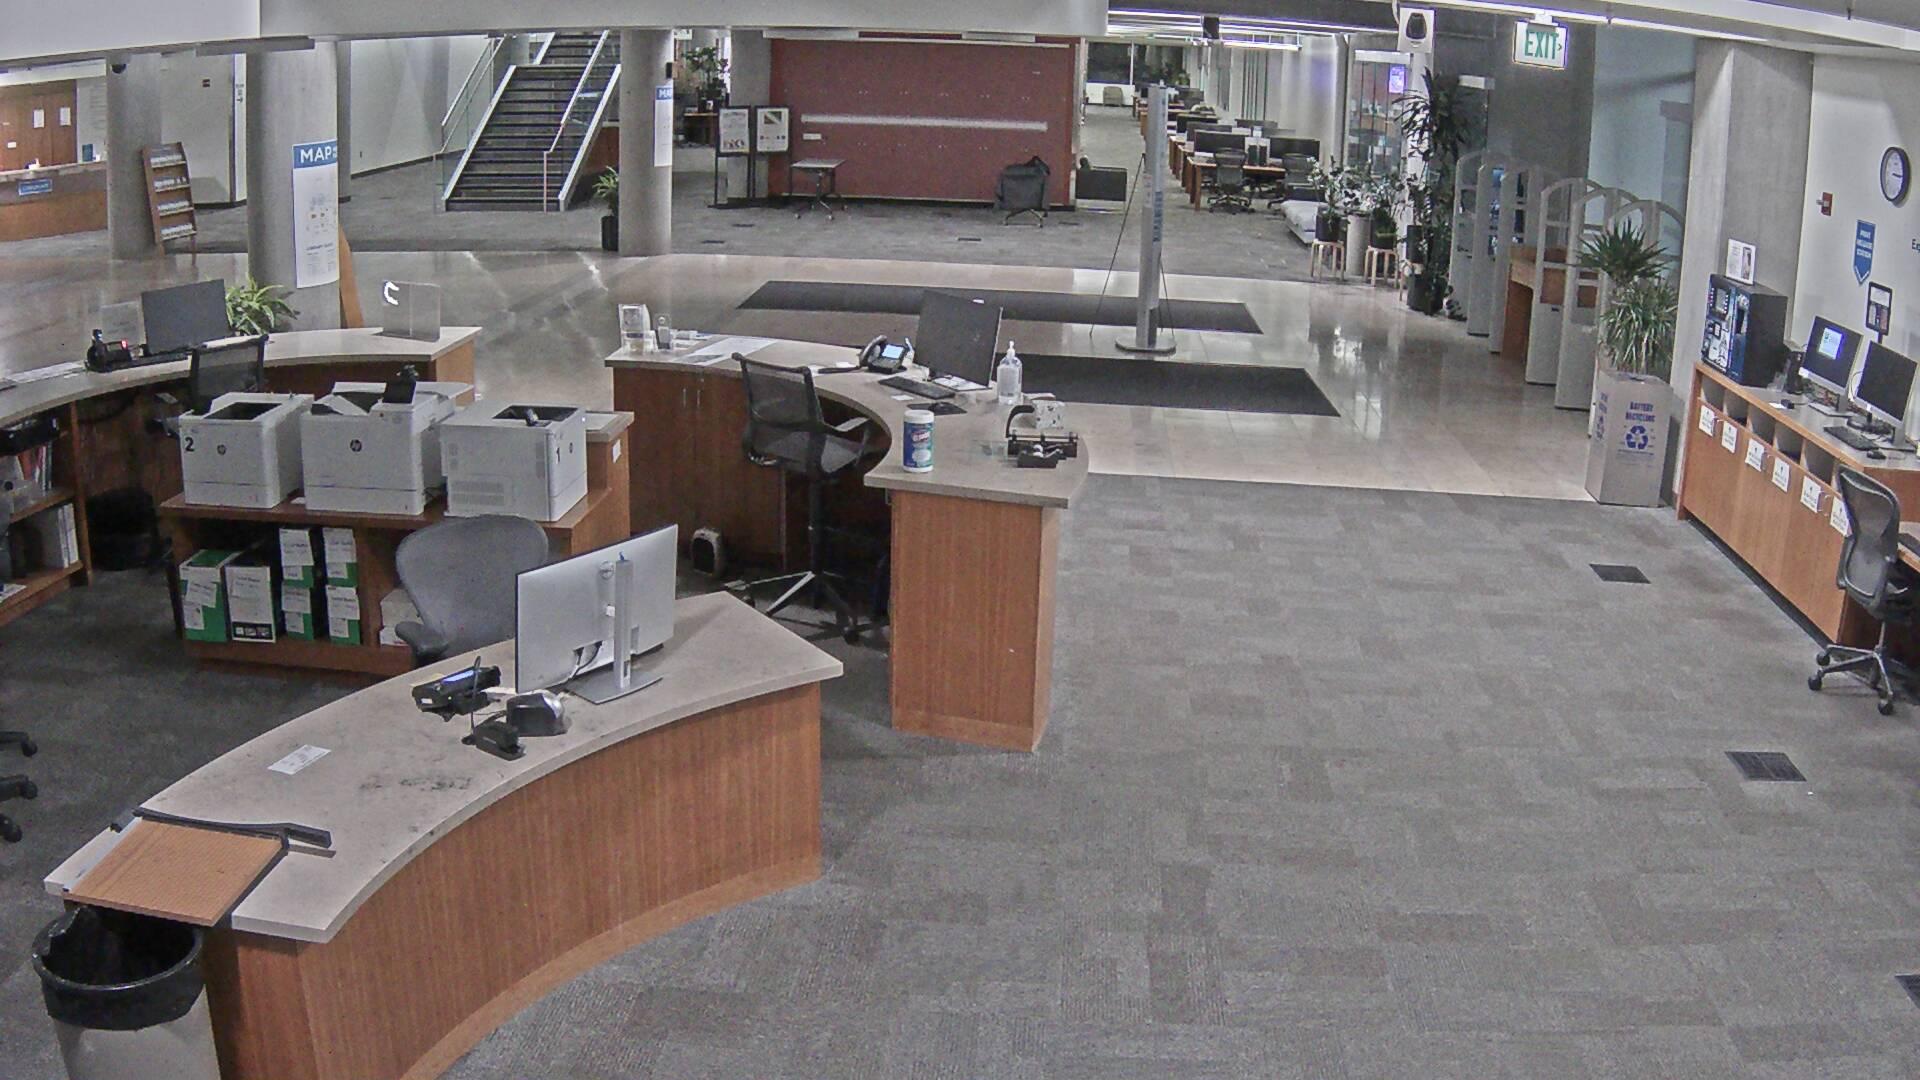 Library South entrance live camera